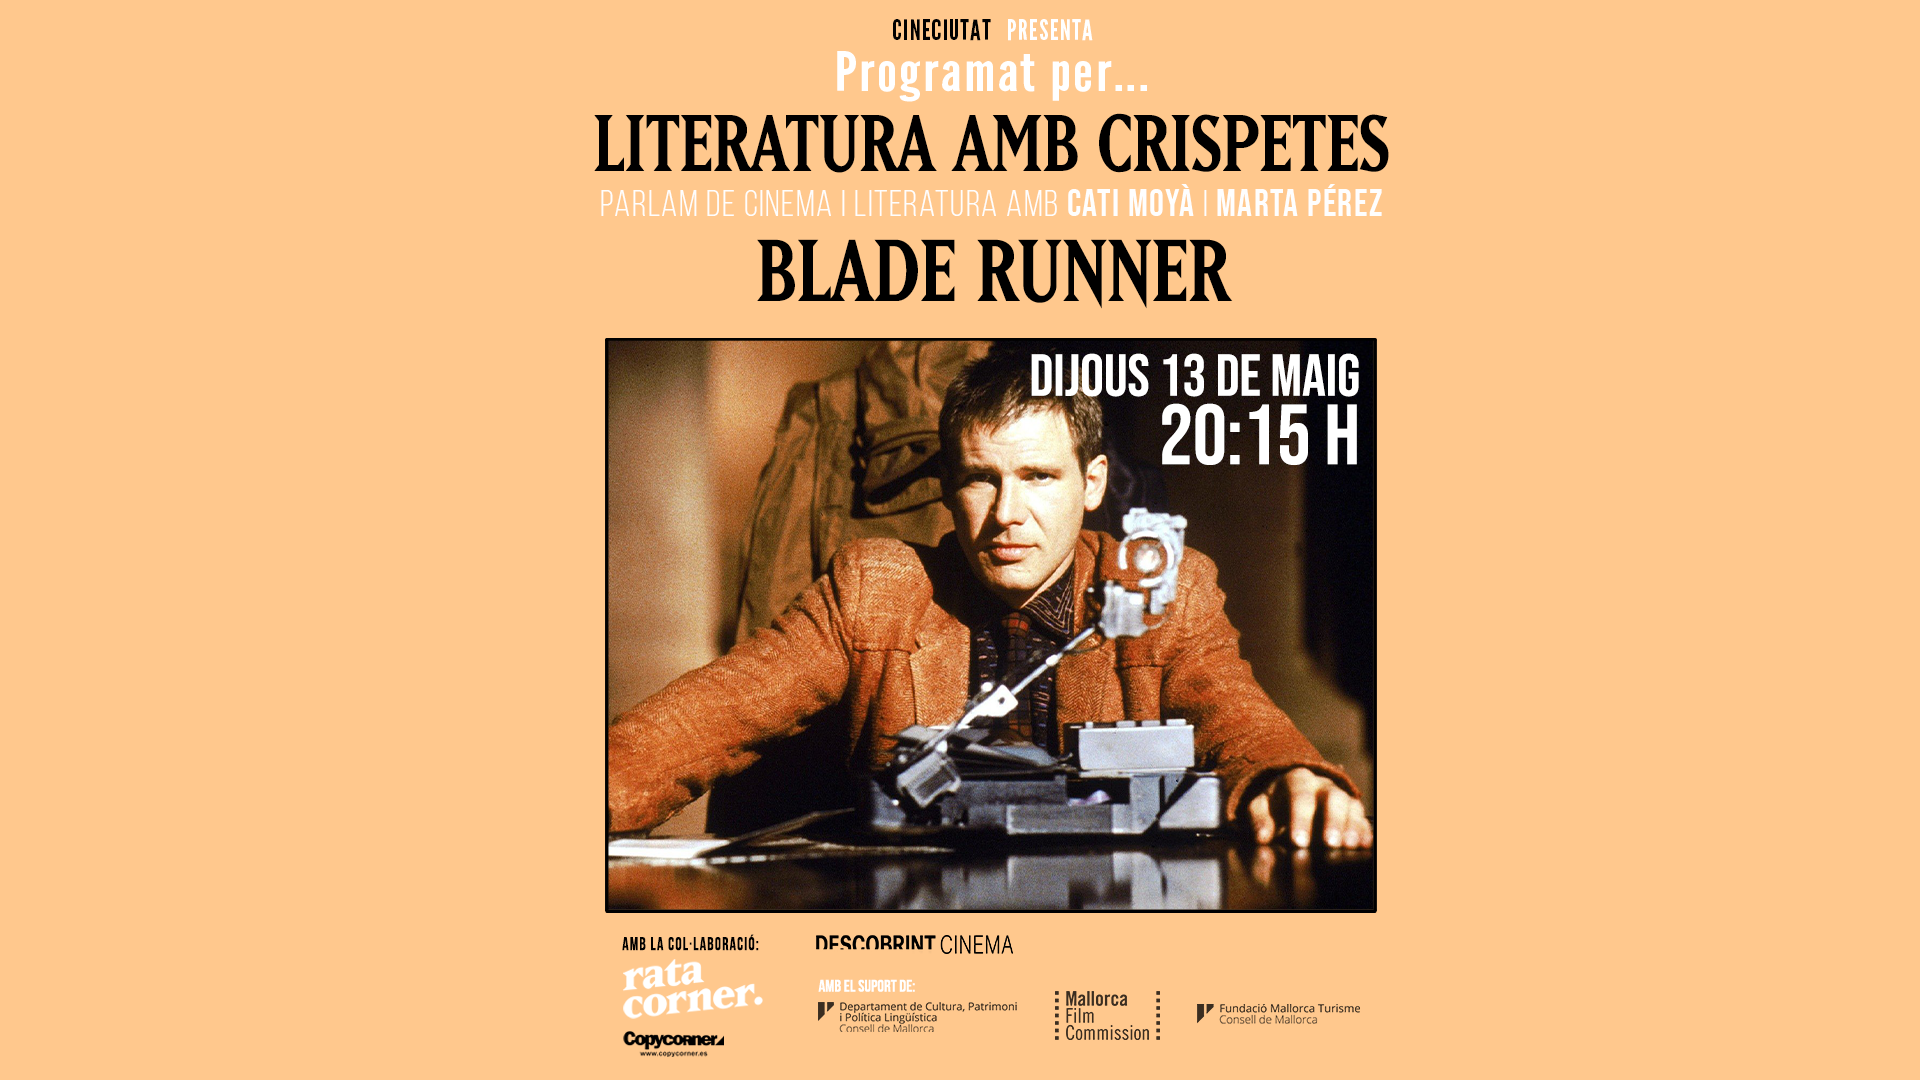 ProgramatPer_LiteraturaCrispetes_Screen_BladeRunner.png